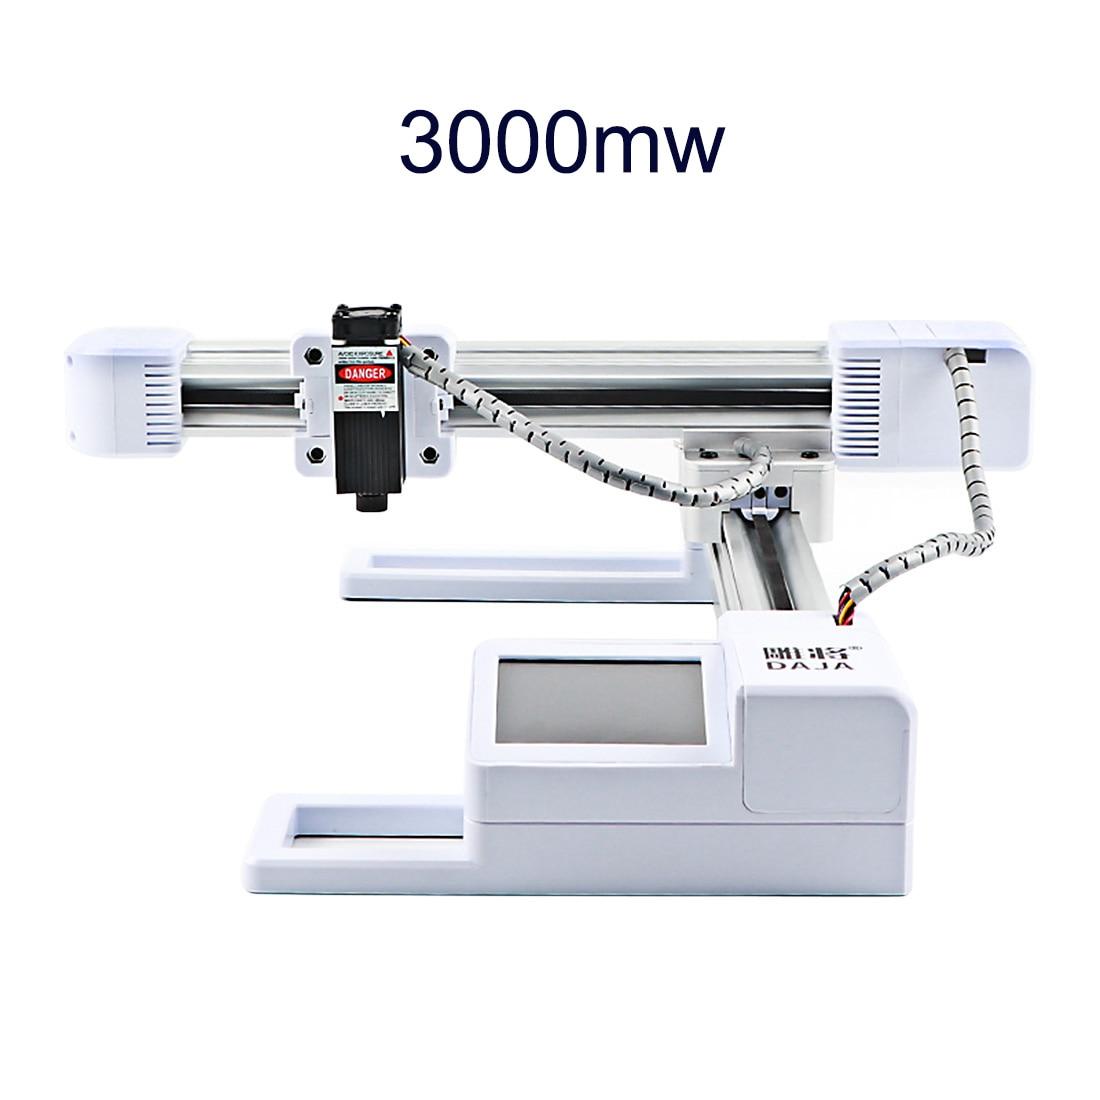 J3 3000mw 4500mw 7000mw Touch Screen DIY Laser Engraving Machine Mini Engraver Cutting Machine With WIFI - US Plug/EU Plug/UK